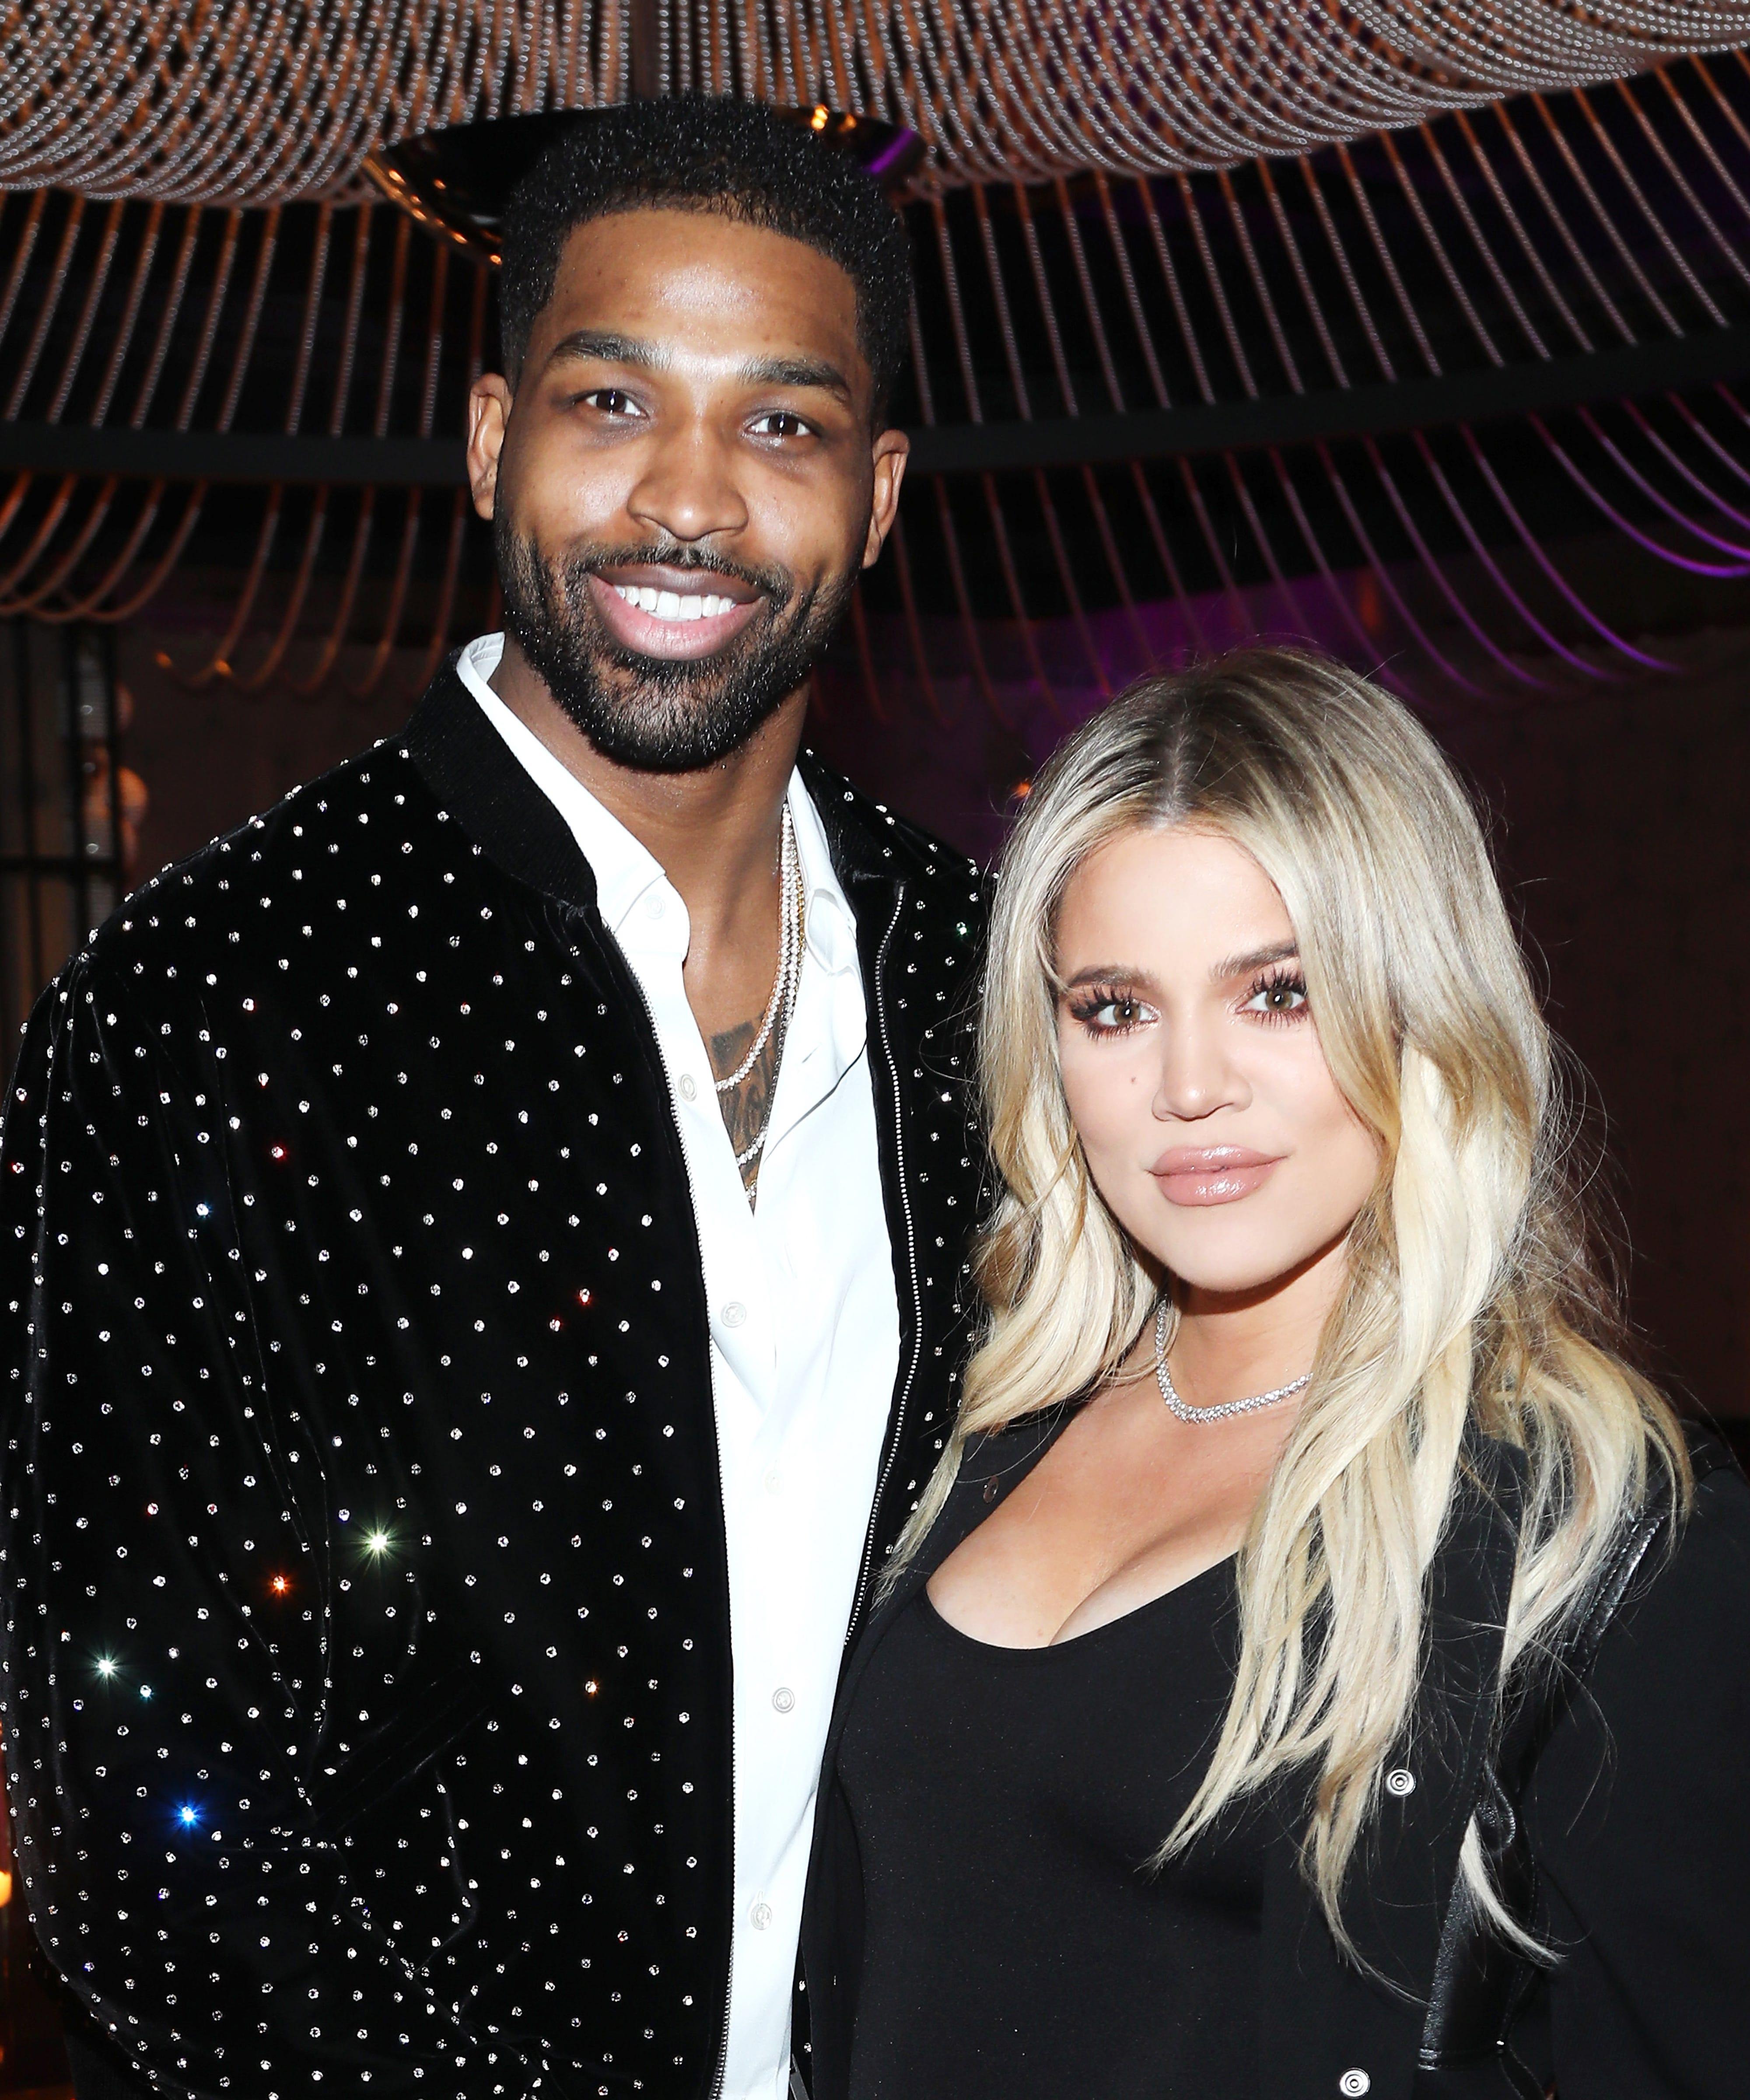 Khloé Kardashian Breaks Her Silence on the Tristan Thompson Cheating Scandal